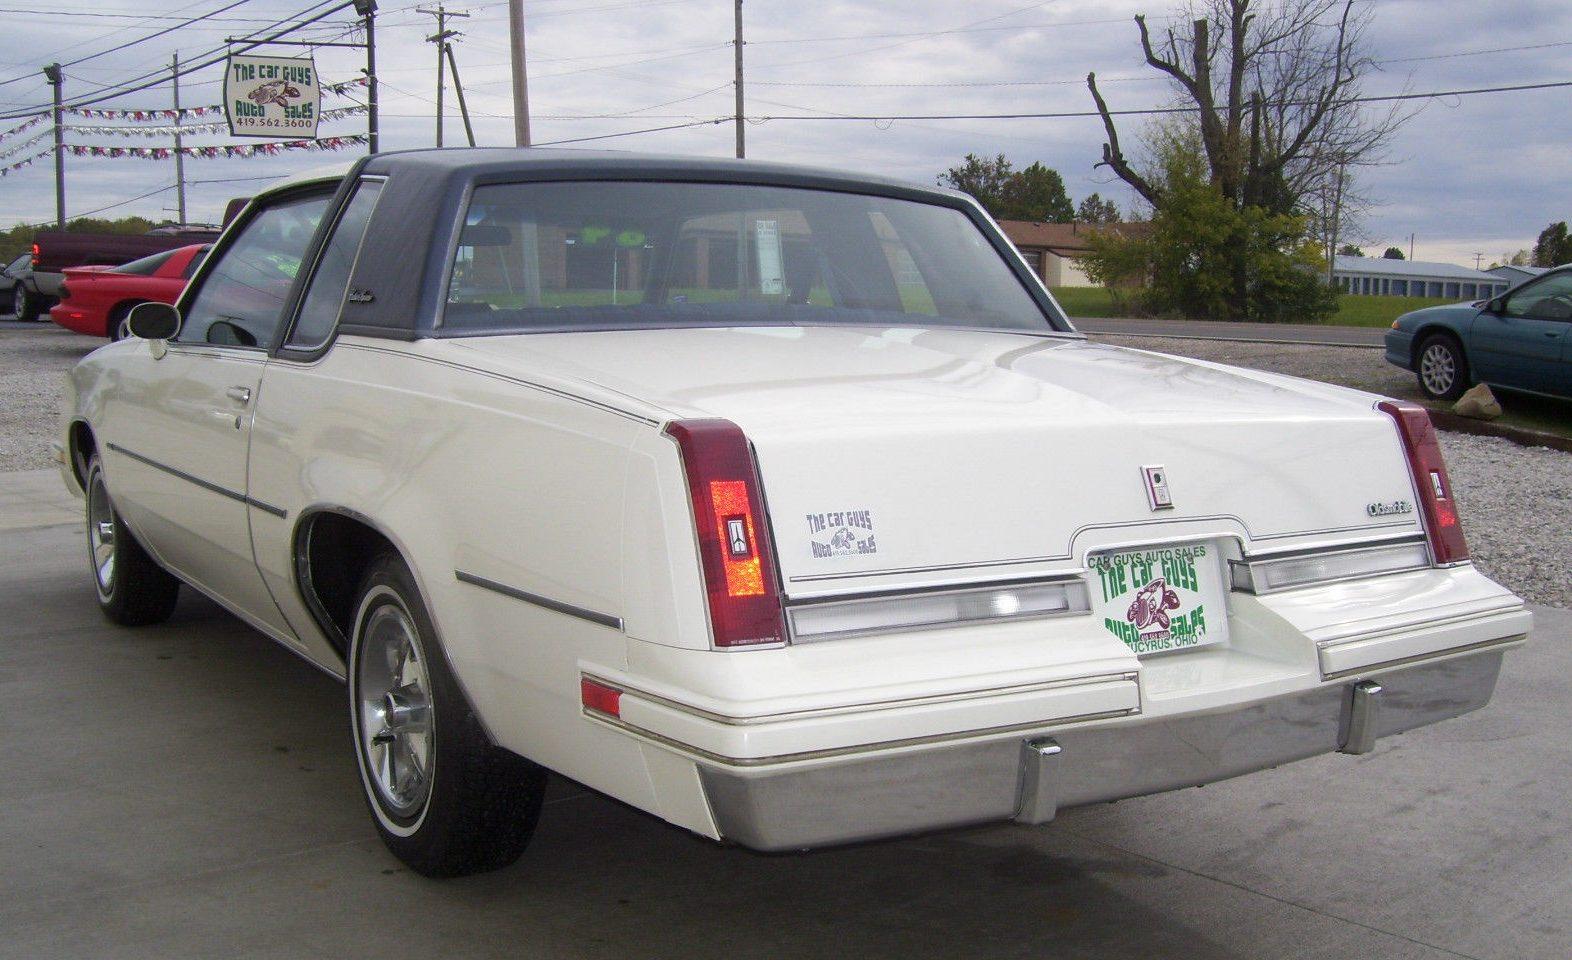 7,124 Miles: 1984 Olds Cutlass